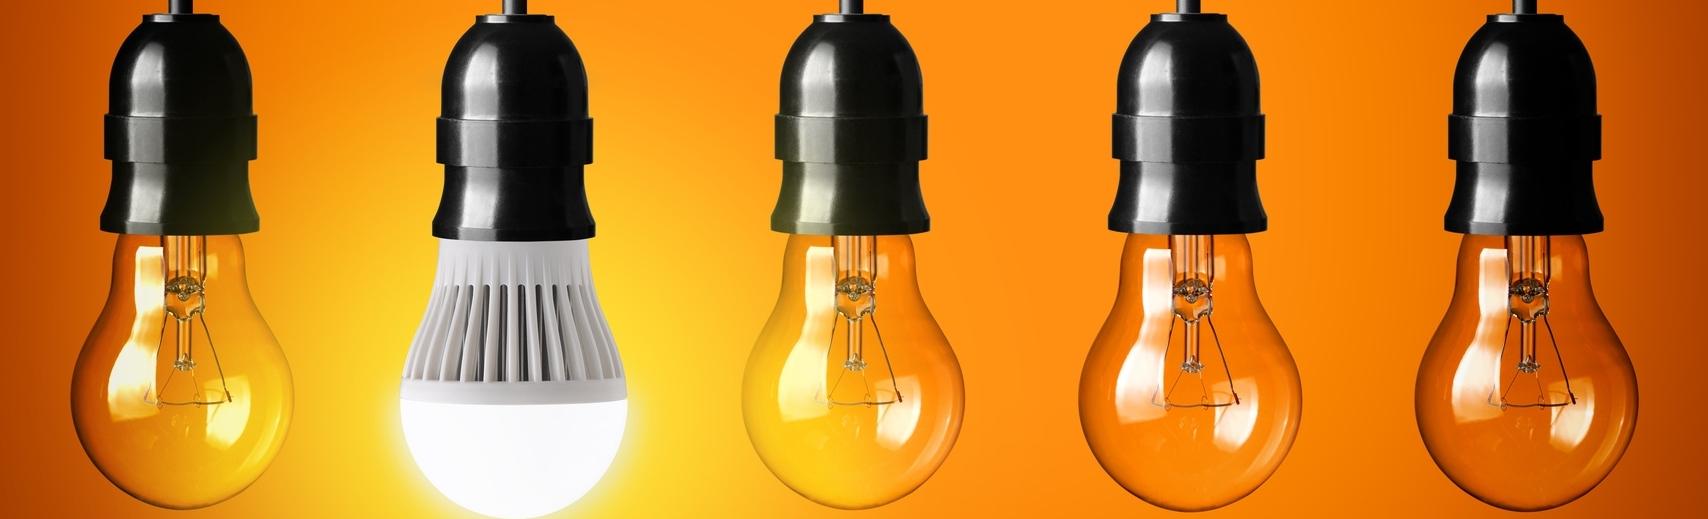 Lampen1